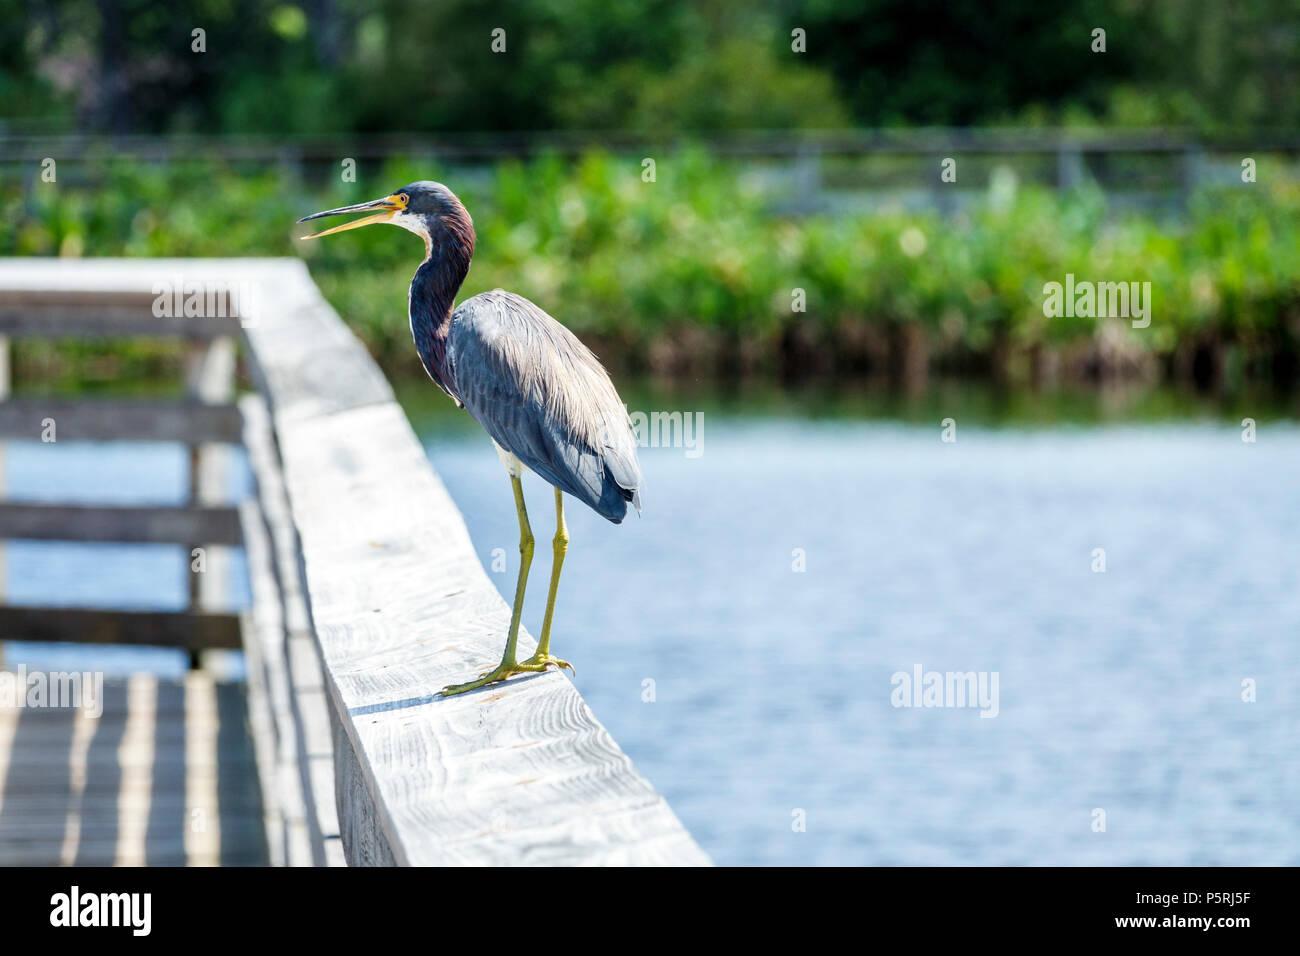 Delray Beach Florida Wakodahatchee Wetlands nature wildlife preserve park boardwalk trail protected bird habitat water reclamation project tricolored - Stock Image